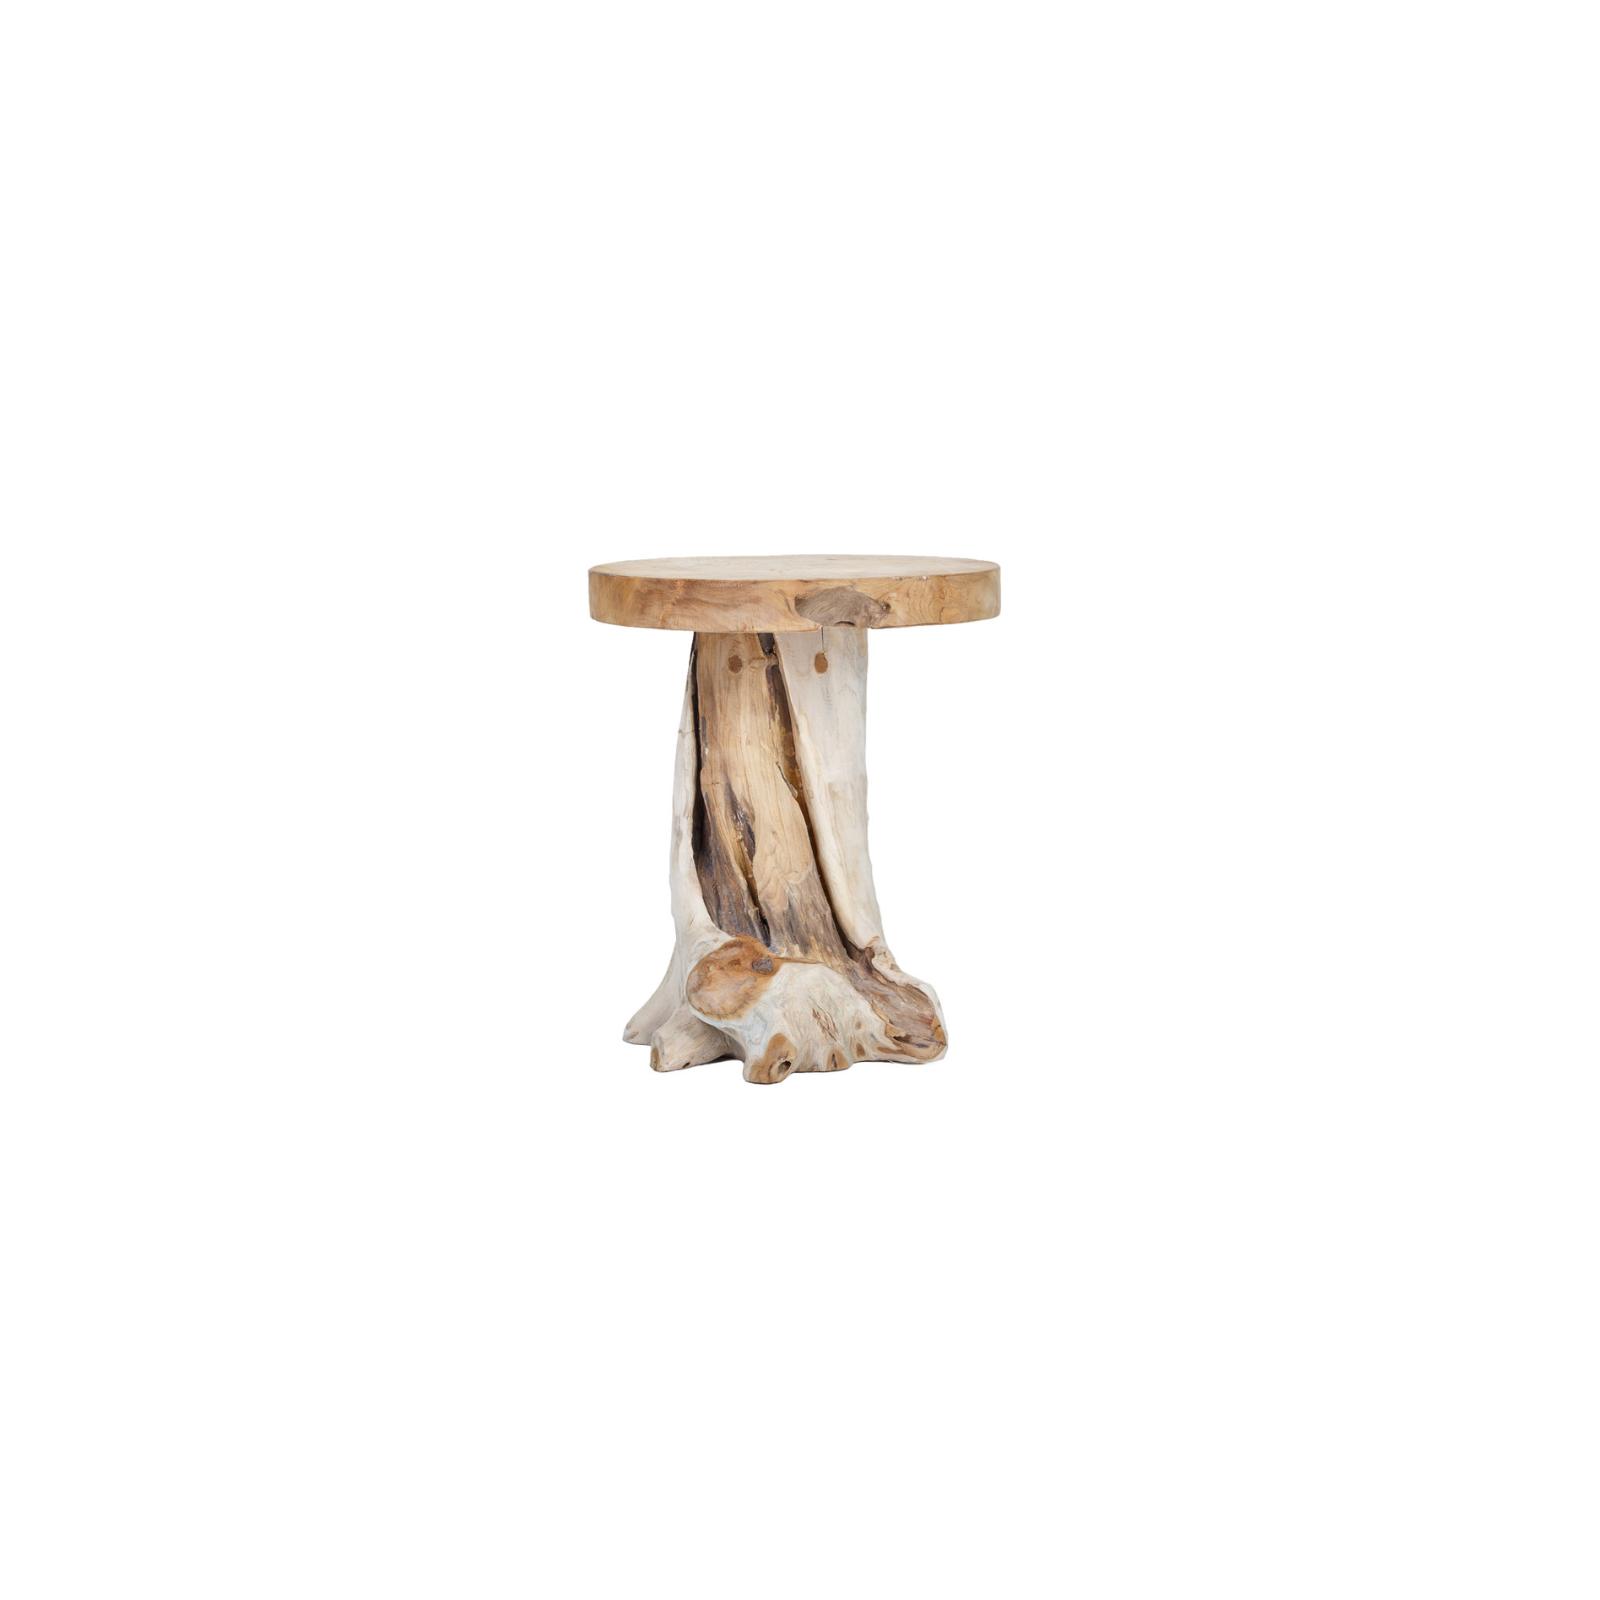 Racine tabouret champignon Assises - 1